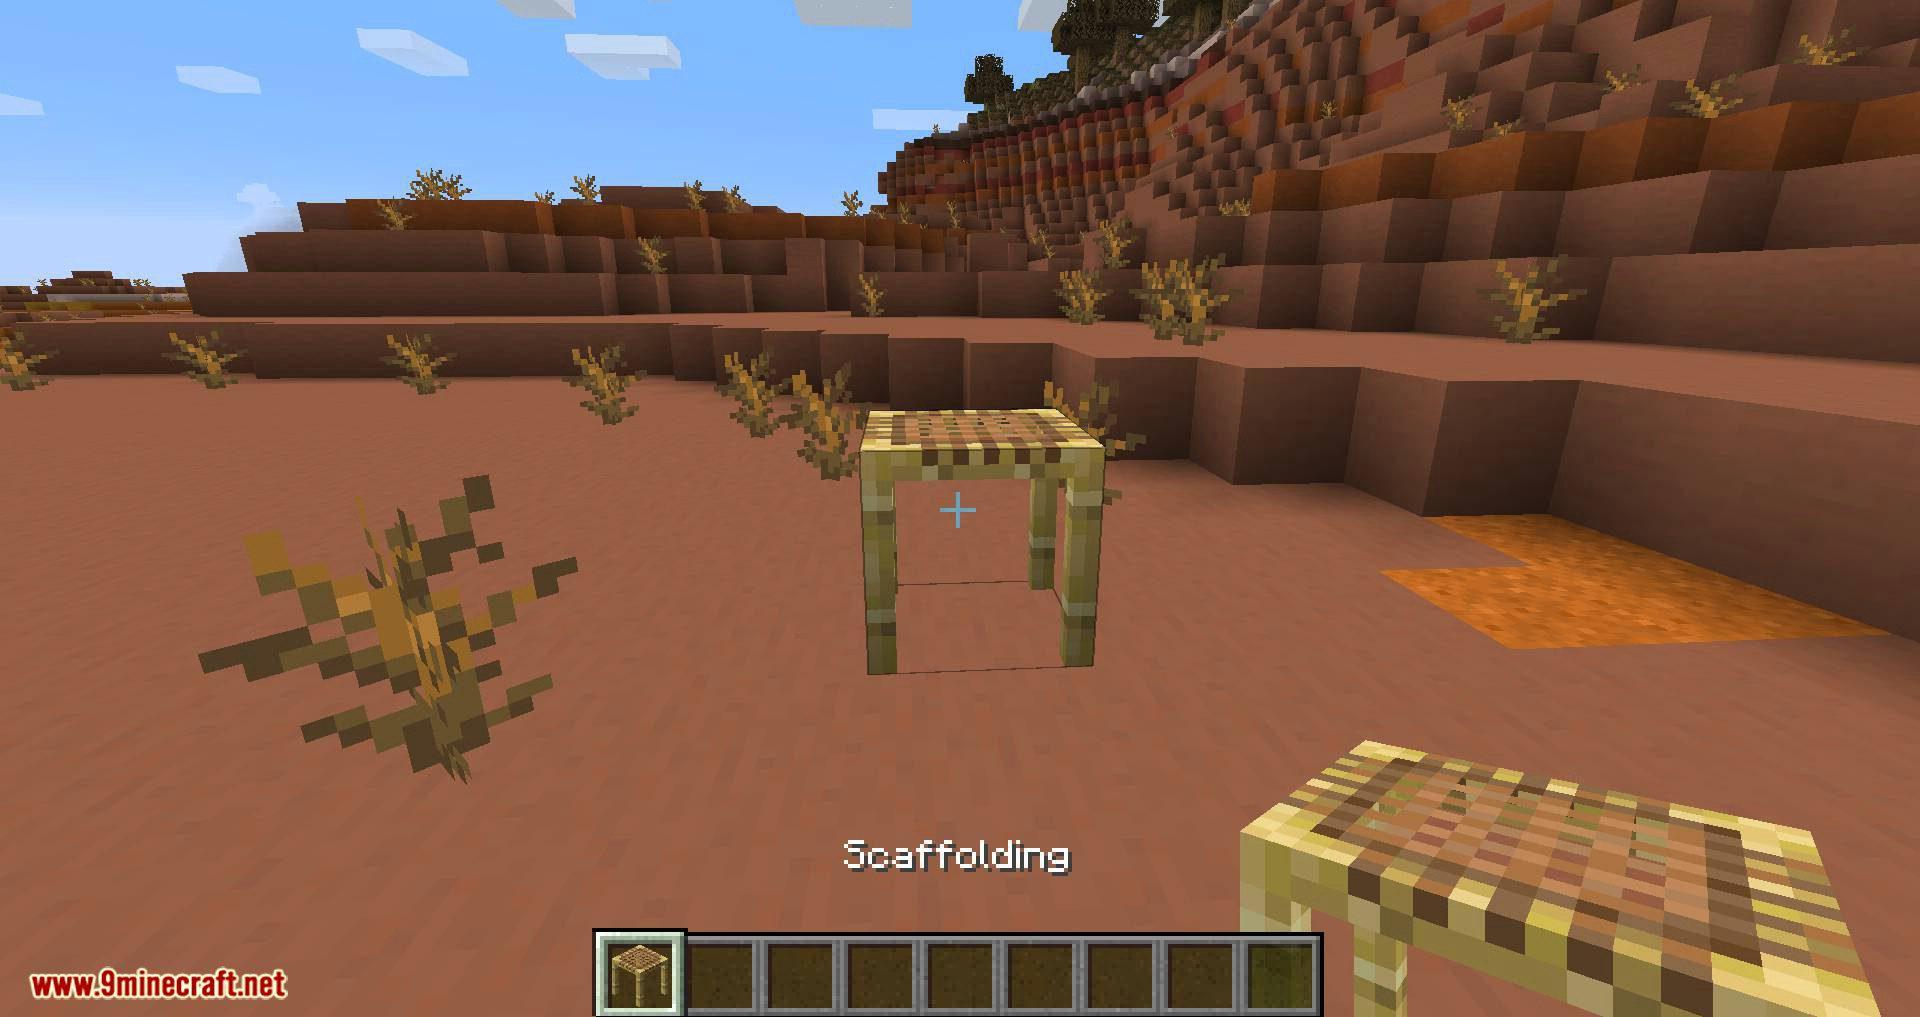 Scaffolding behavior mod for minecraft 01